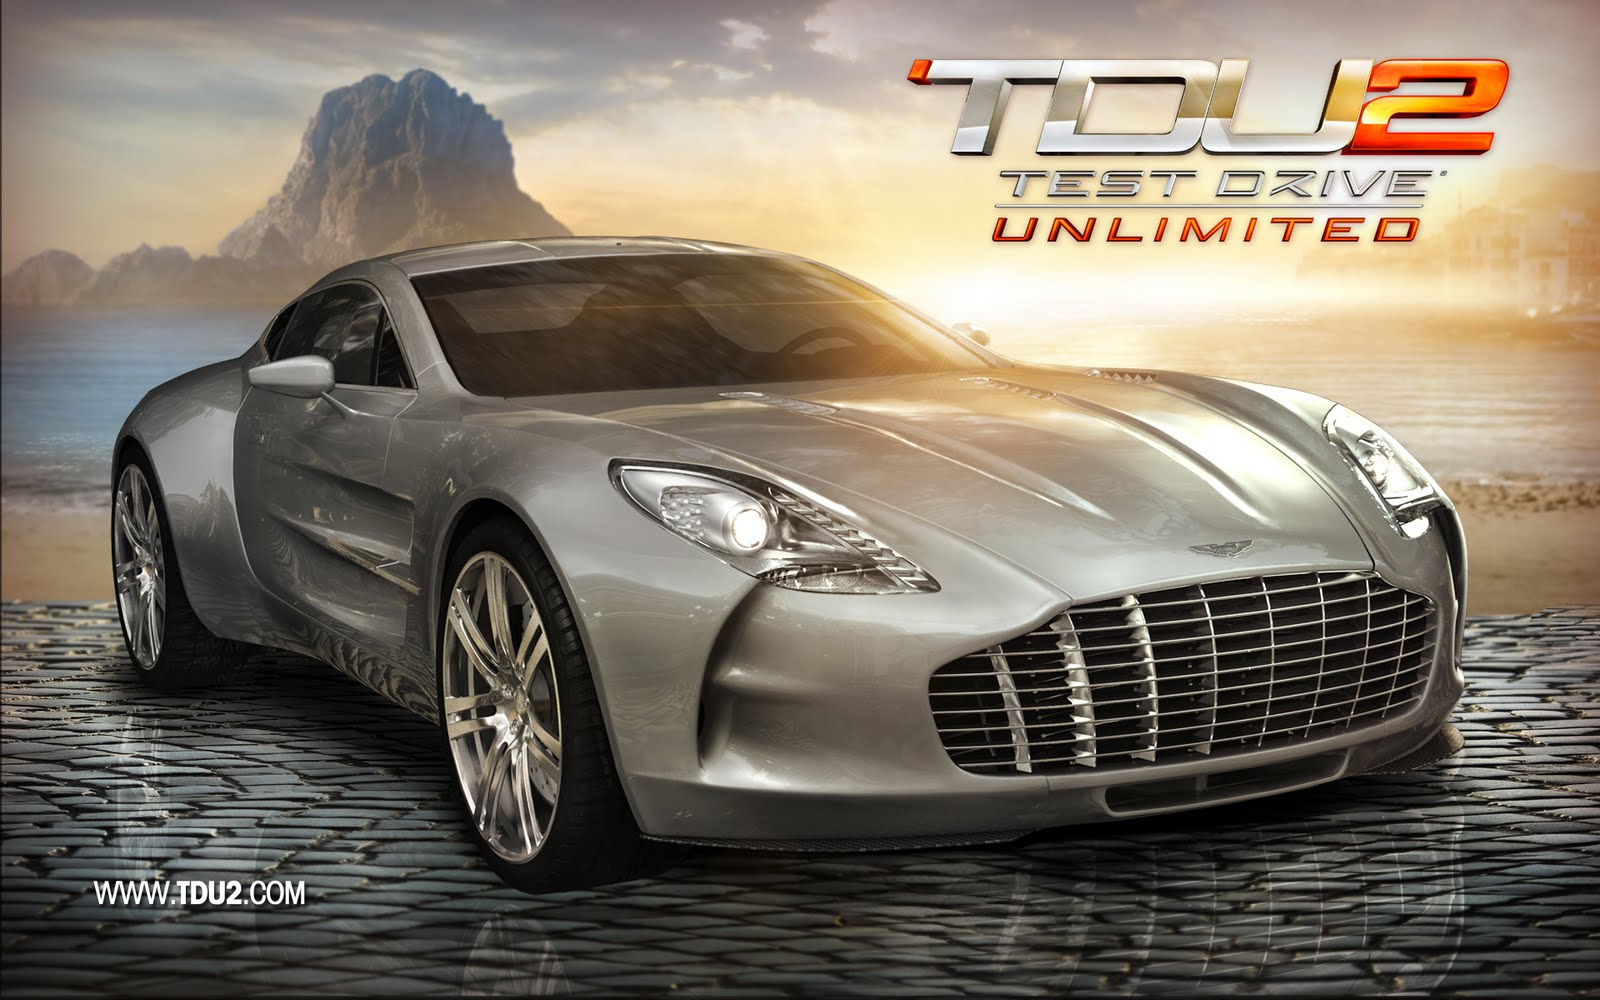 http://1.bp.blogspot.com/-OFM6Os9ruN8/TcLztHZjdVI/AAAAAAAAAE4/zkChME6h-fQ/s1600/Test+Drive+Unlimited+2+%25281%2529.jpg